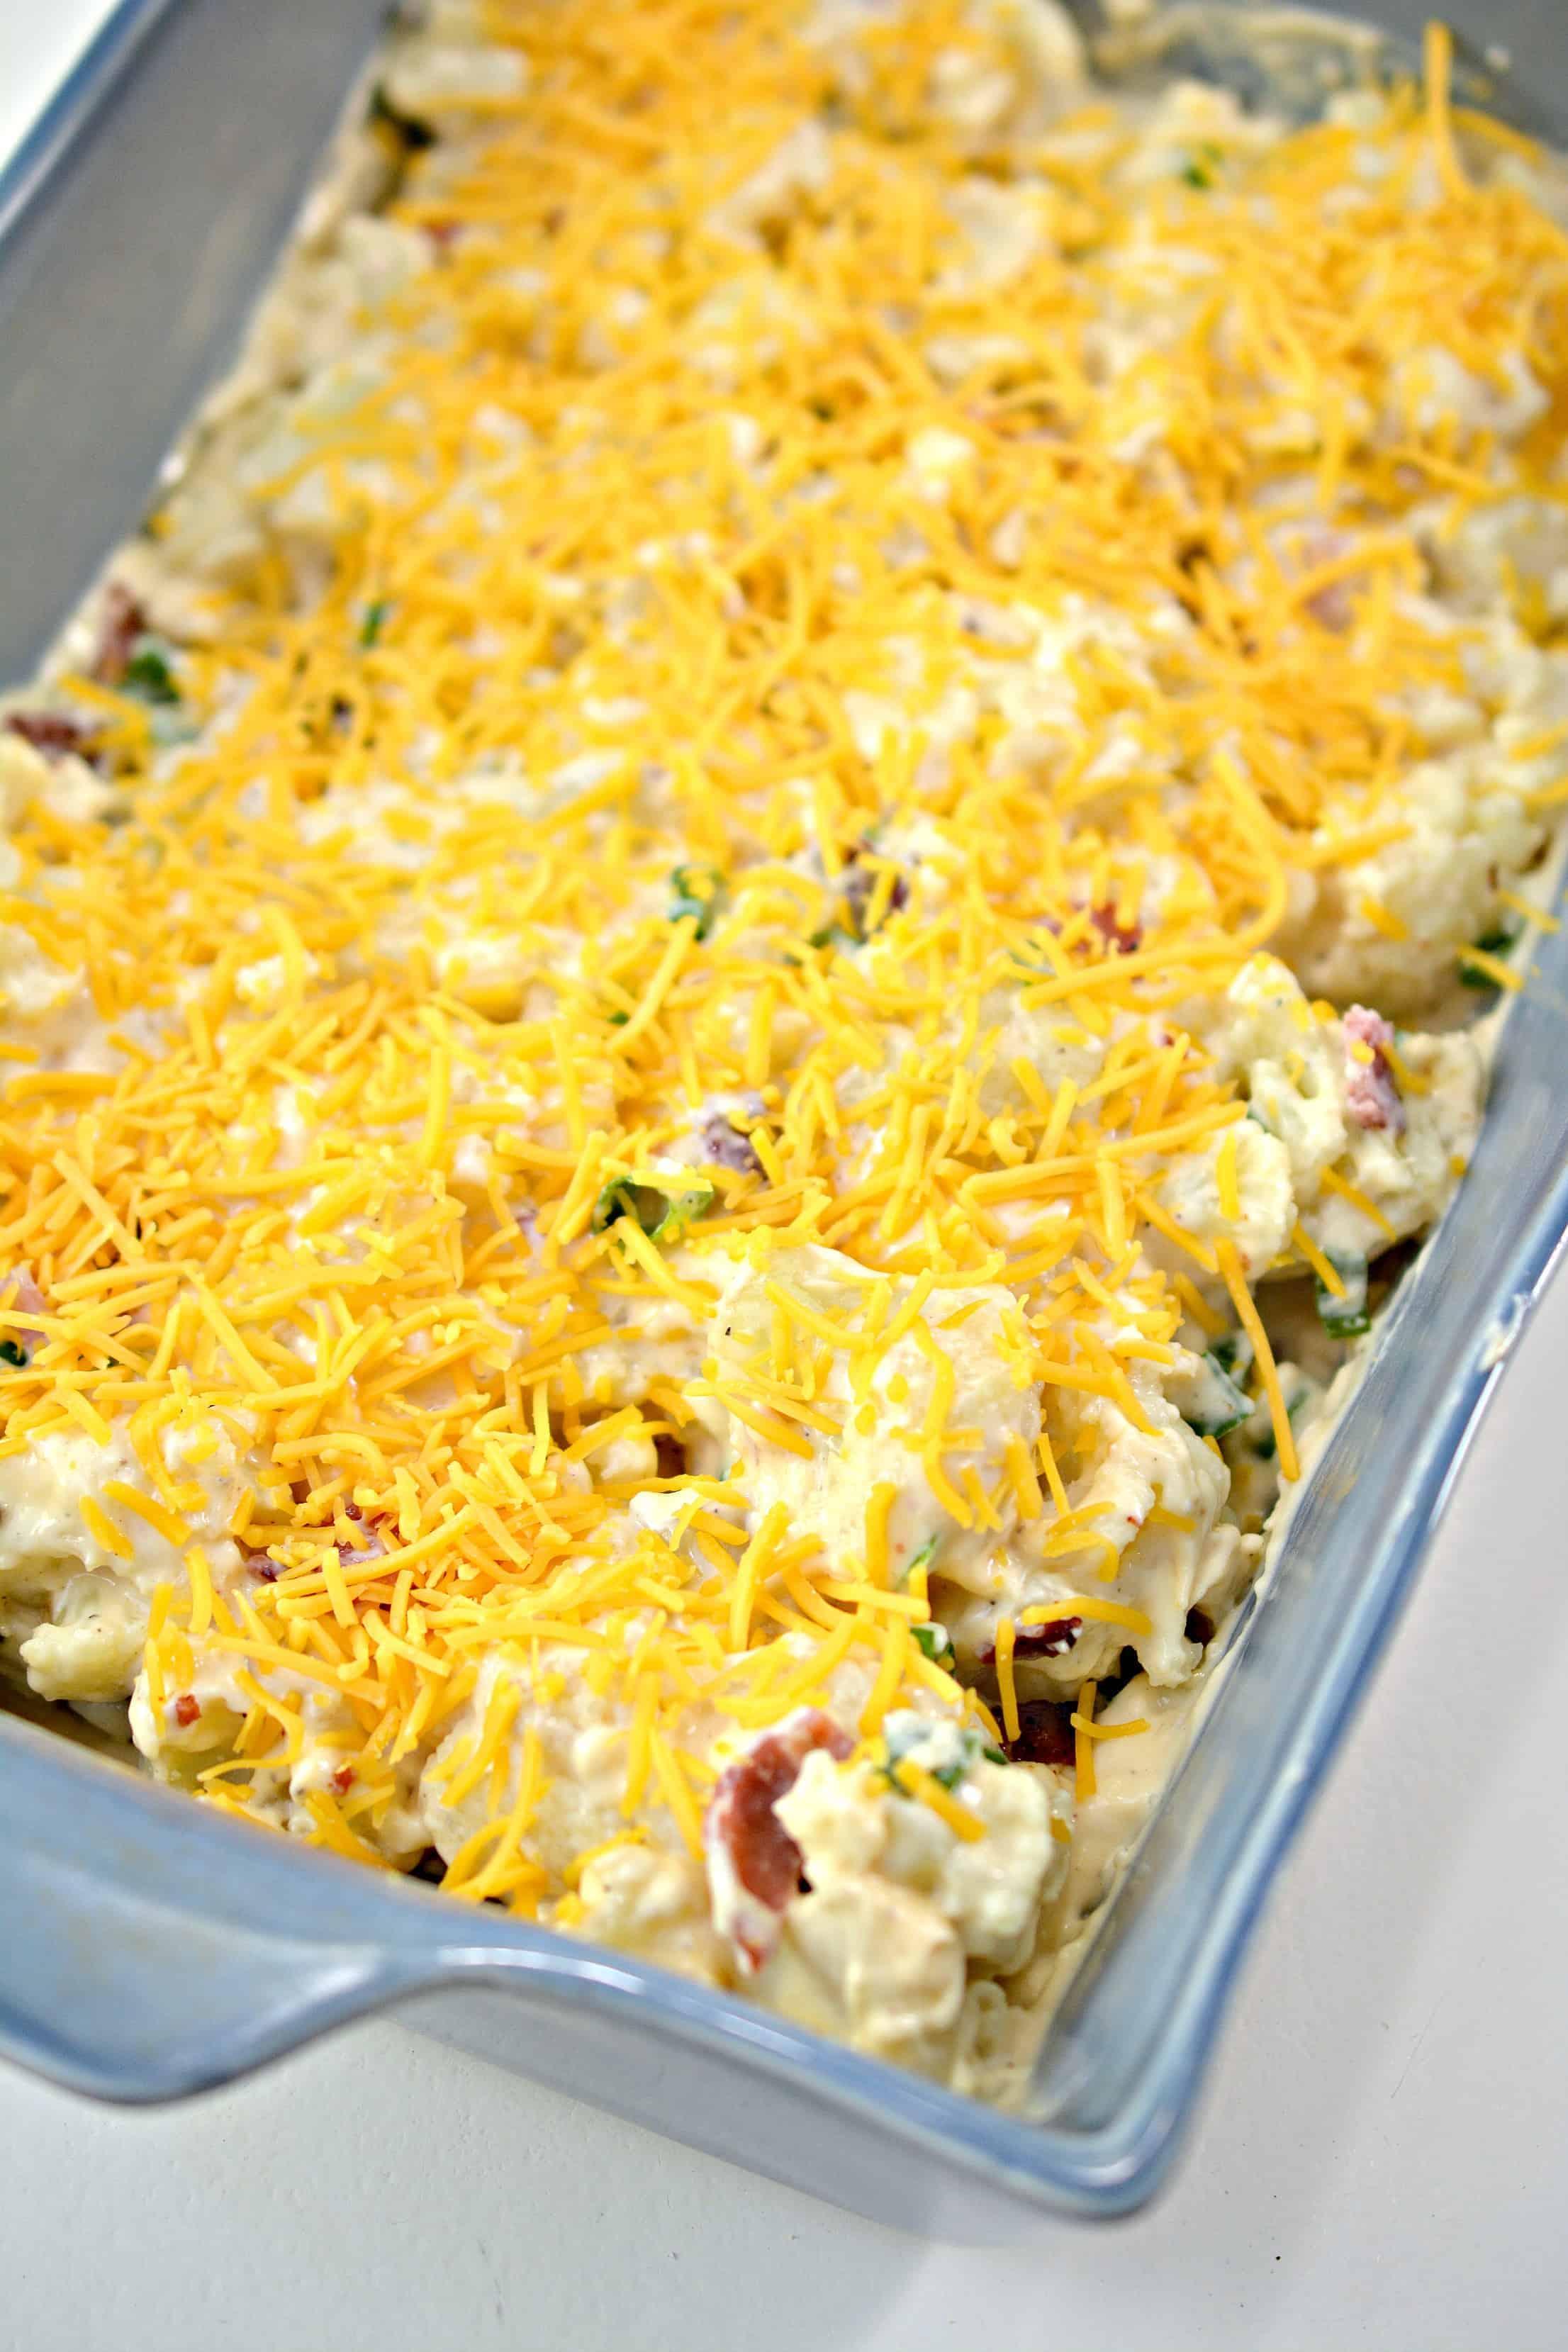 Cheese topping on cauliflower dish